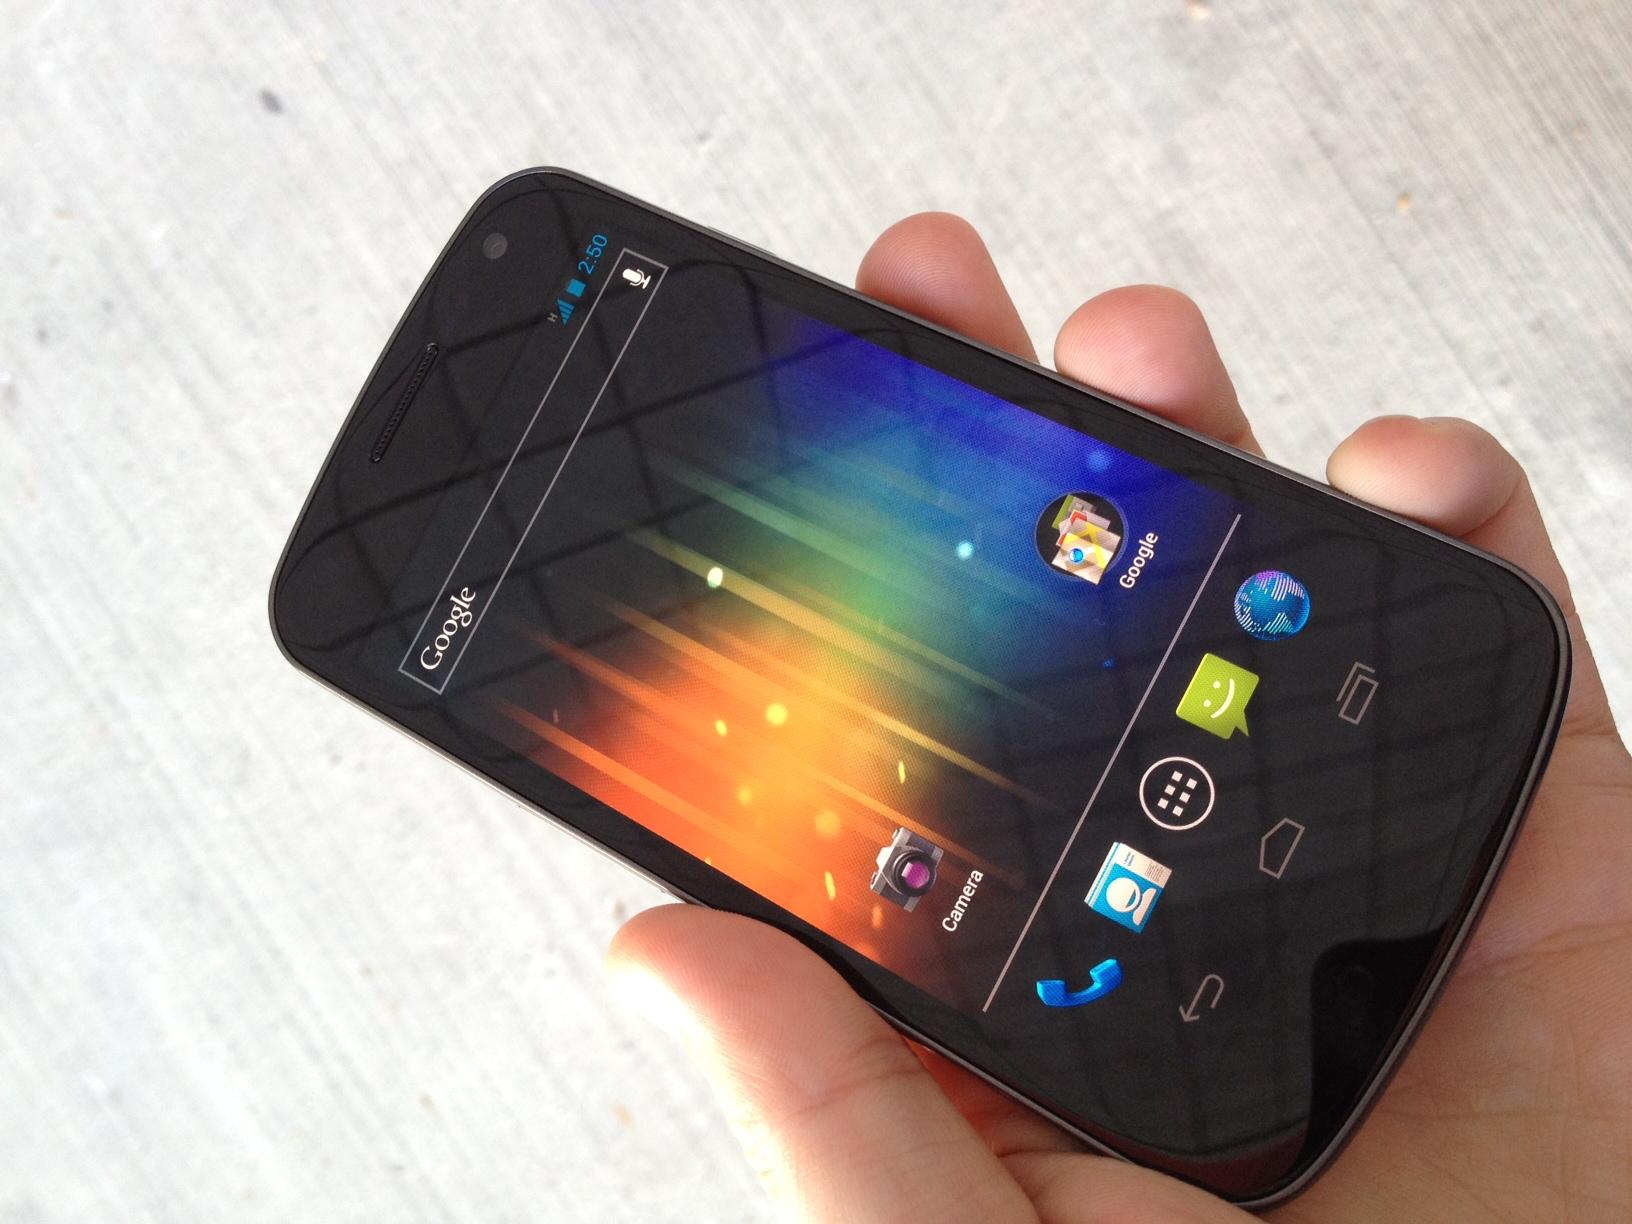 Samsung Galaxy Nexus Goes on Sale in Europe Via Exclusive Partners